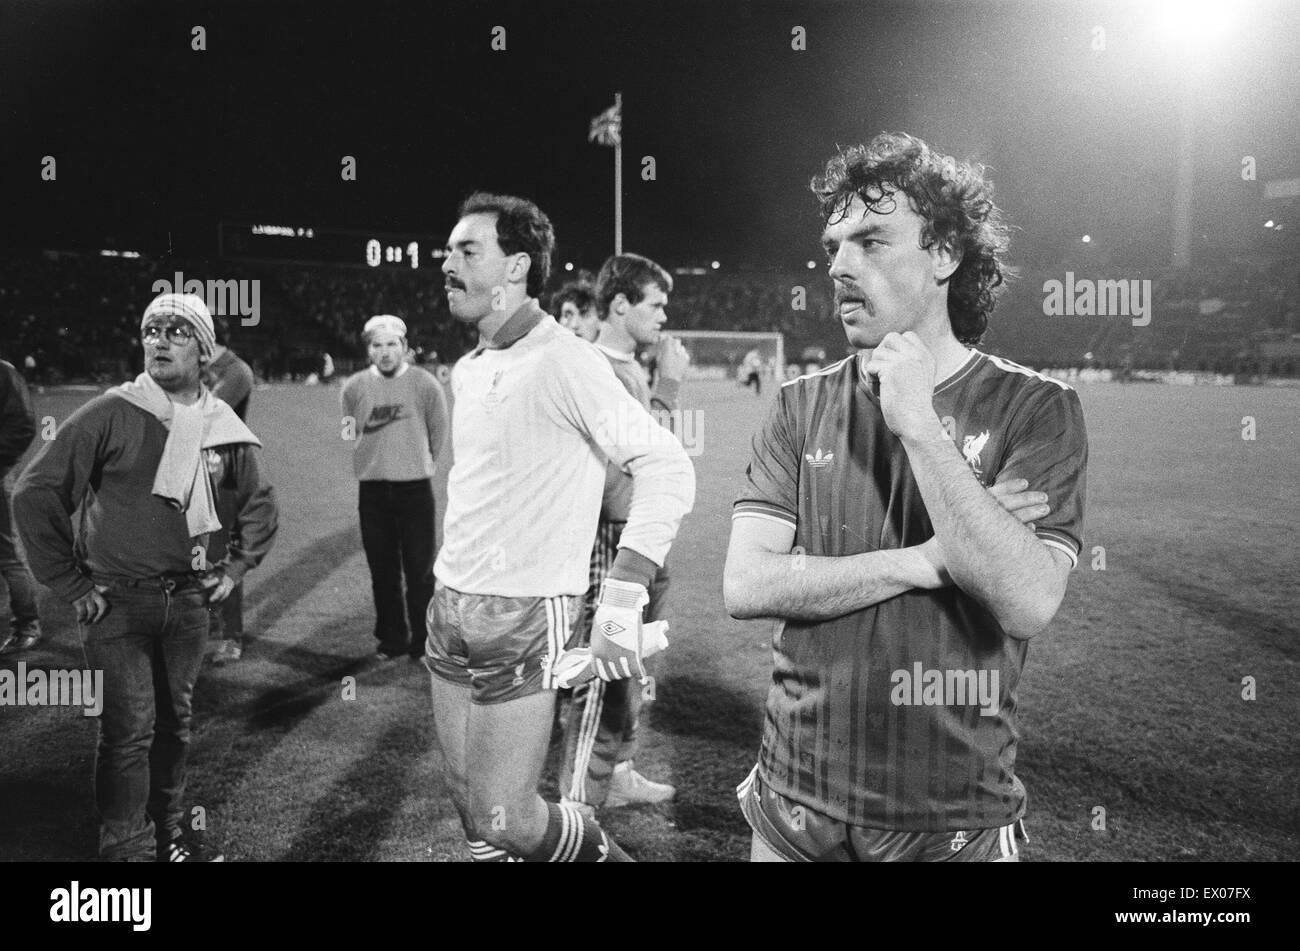 Juventus 1 0 Liverpool 1985 European Cup Final Heysel Stadium Stock Photo Alamy